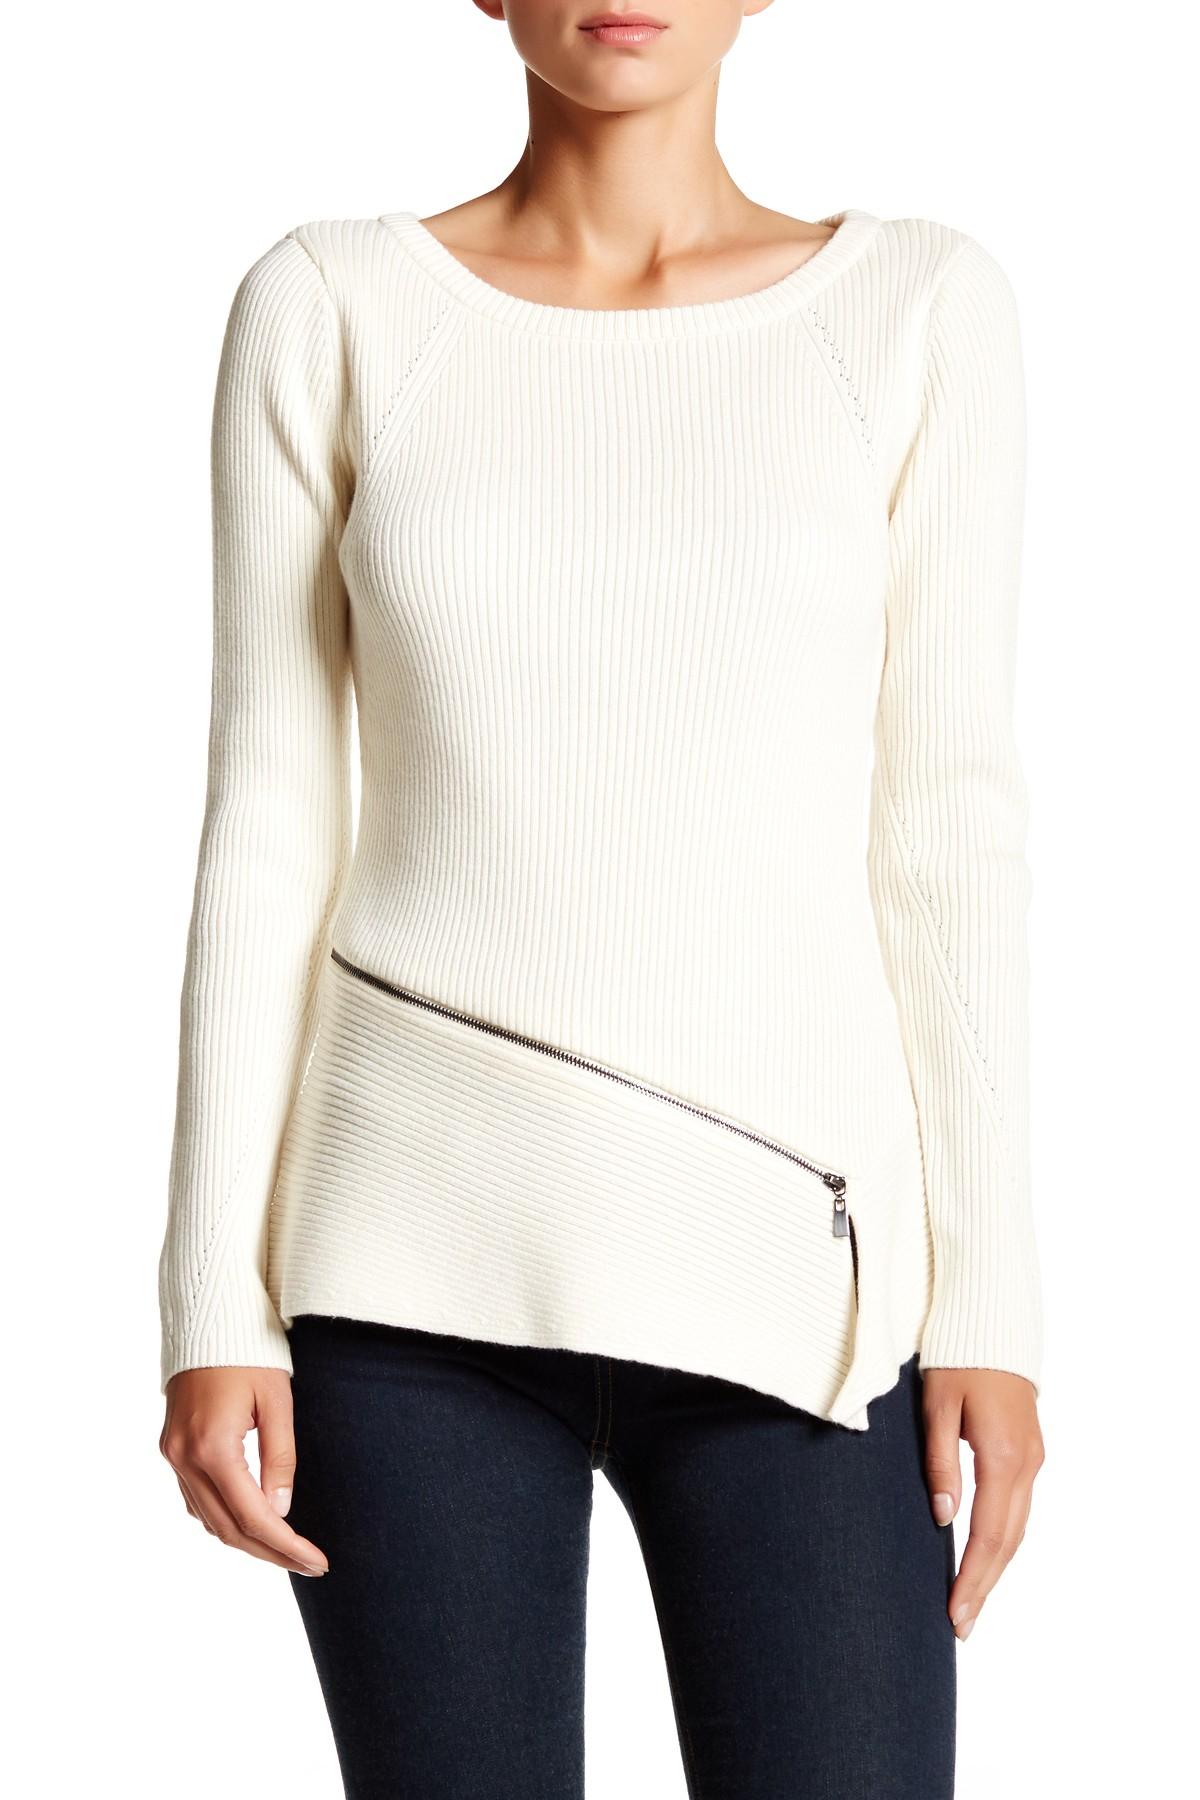 Laundry by shelli segal Zipper Sweater in White | Lyst